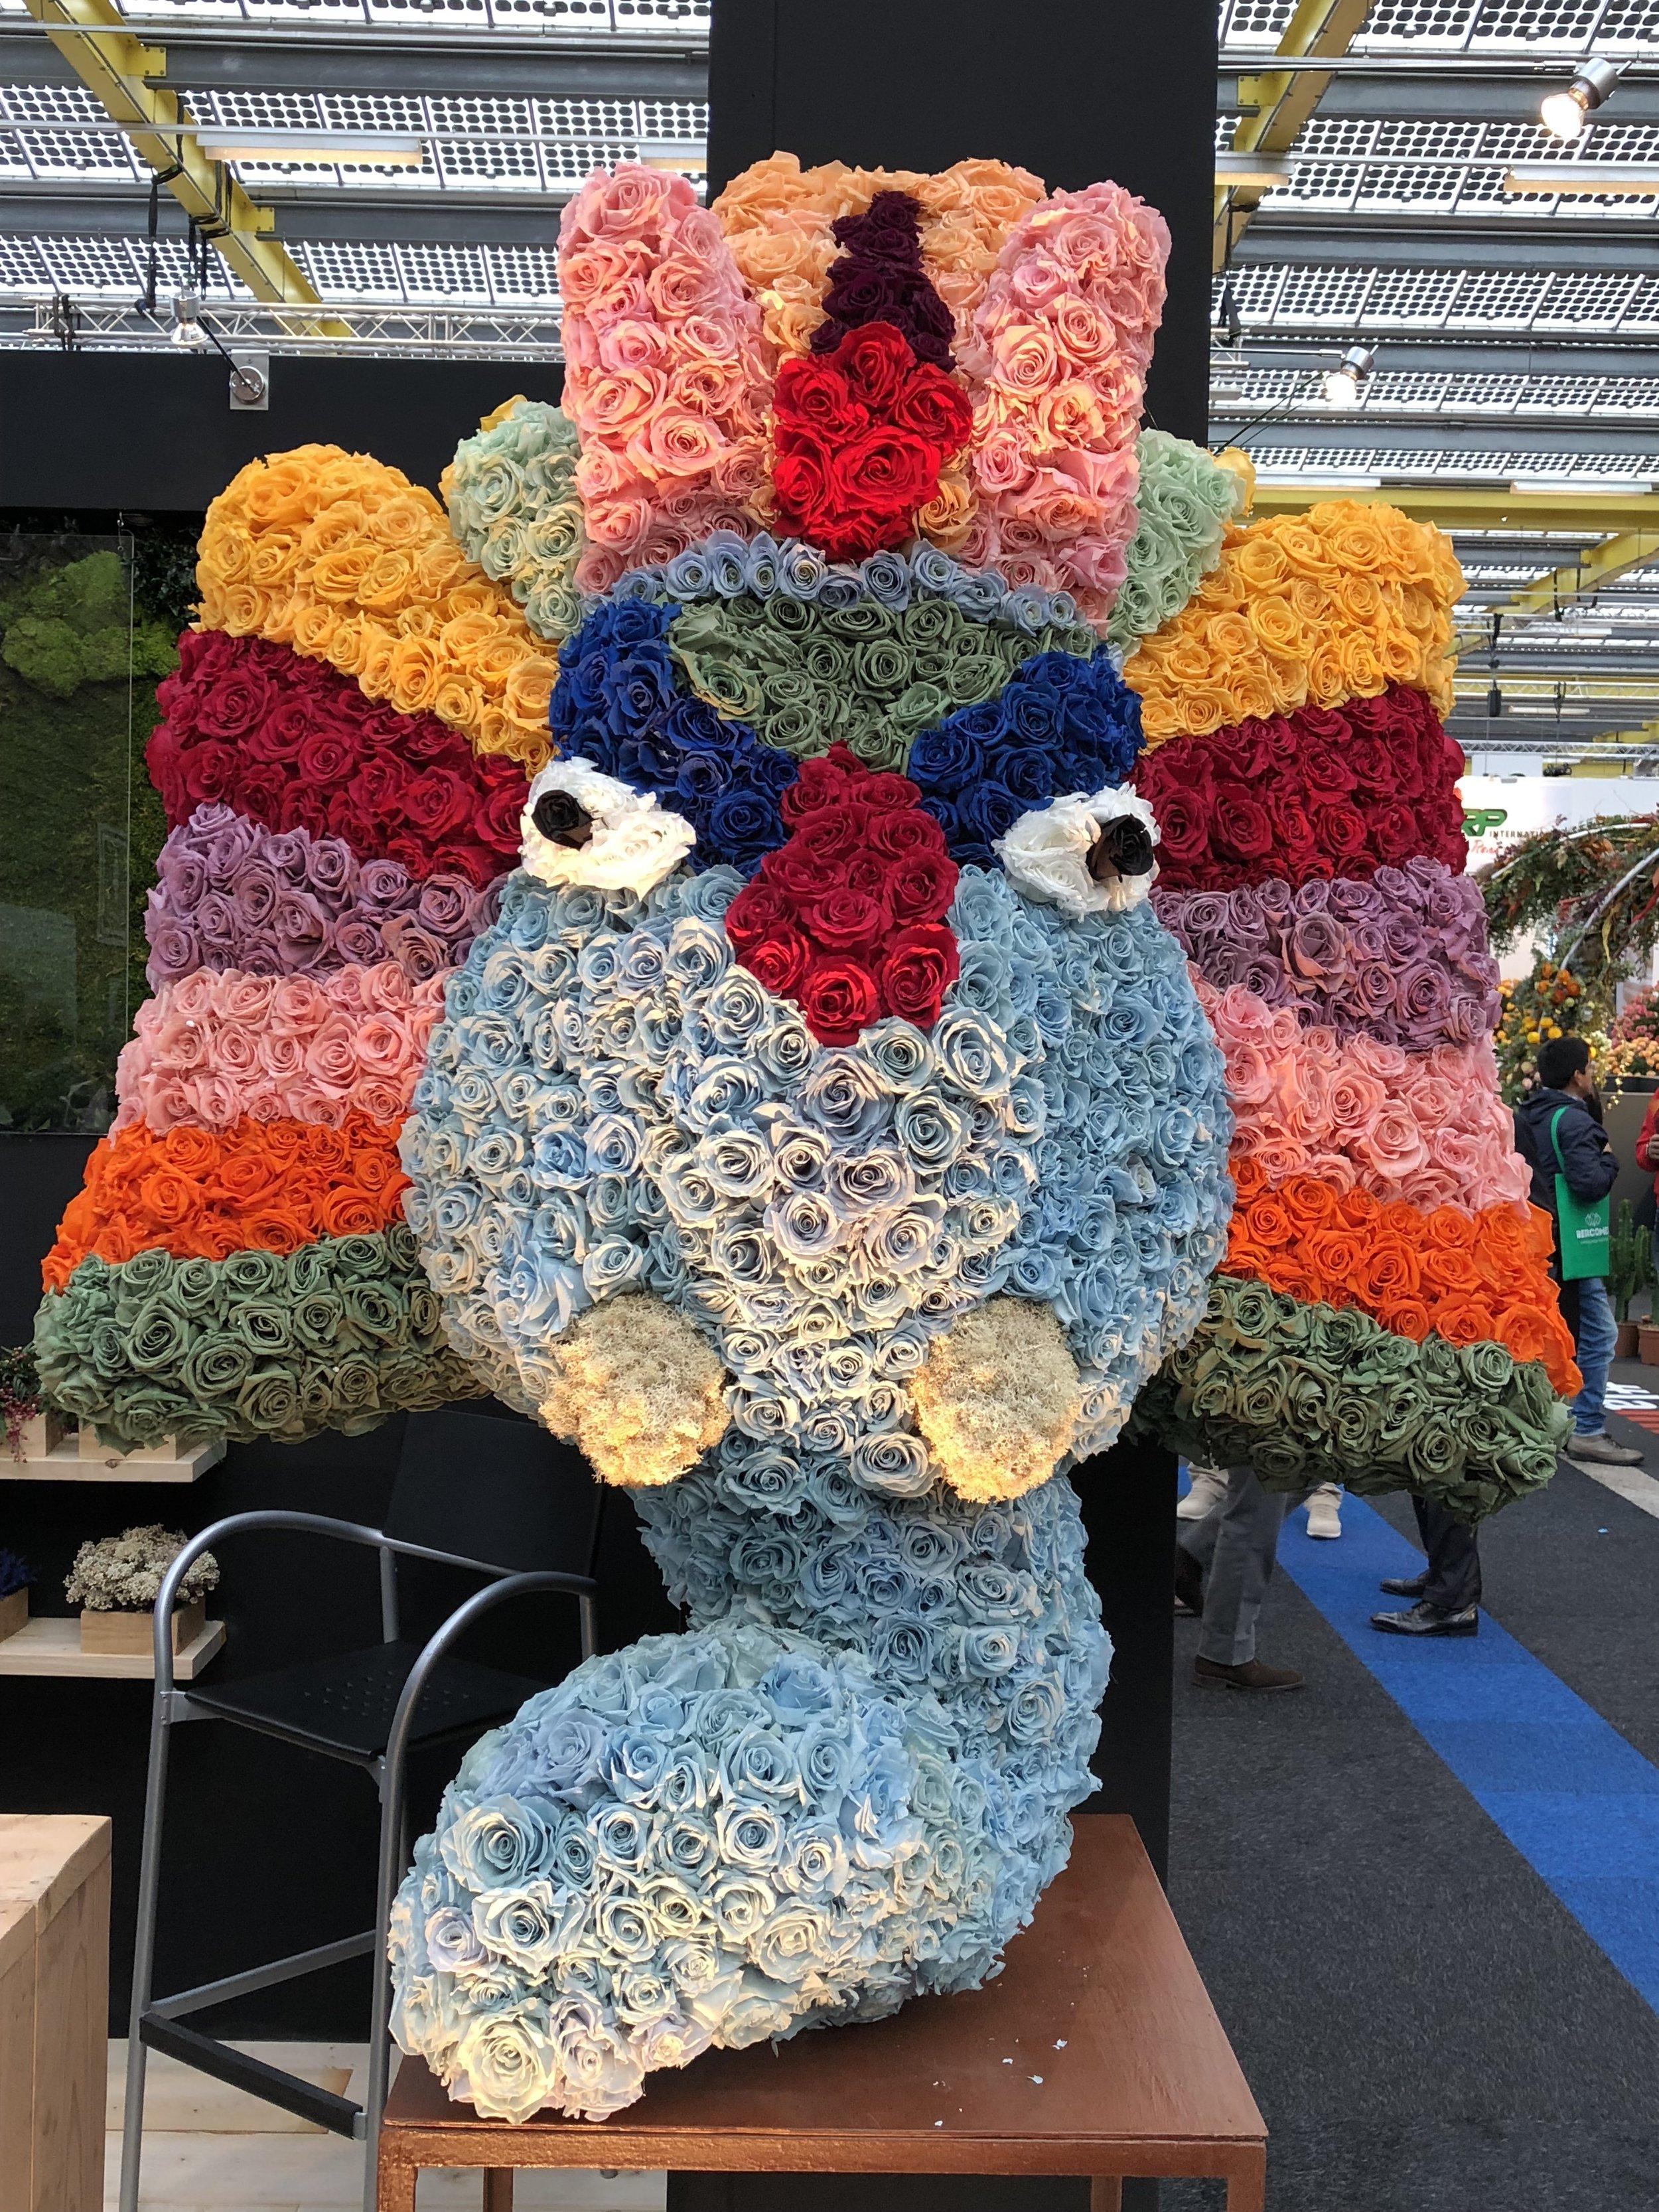 International Flower Show - The Kissters